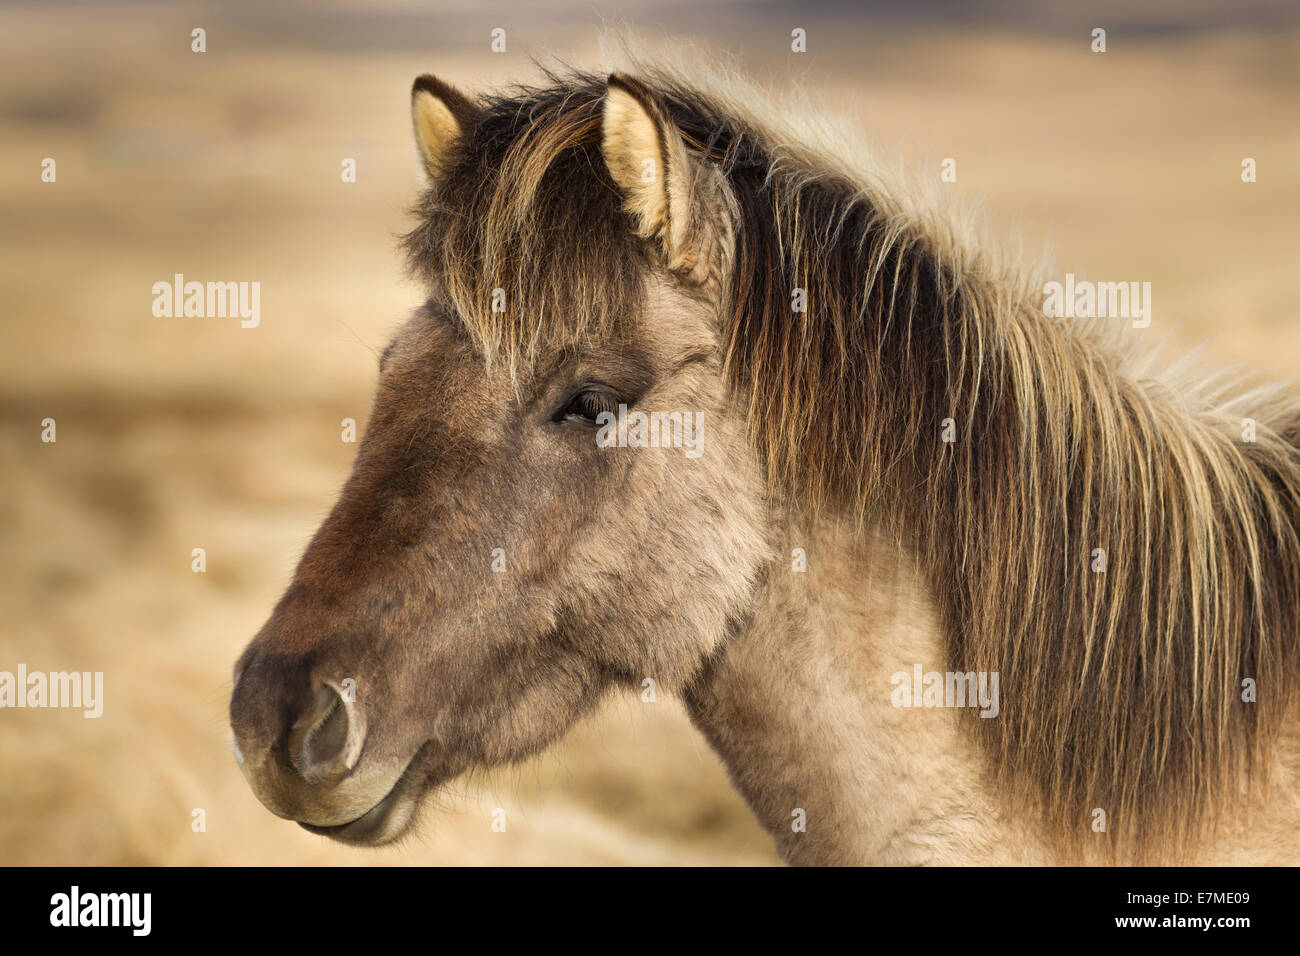 Sideview headshot portrait of an Icelandic horse (Equus ferus caballus) on the Vatnsnes peninsula, northern Iceland. - Stock Image